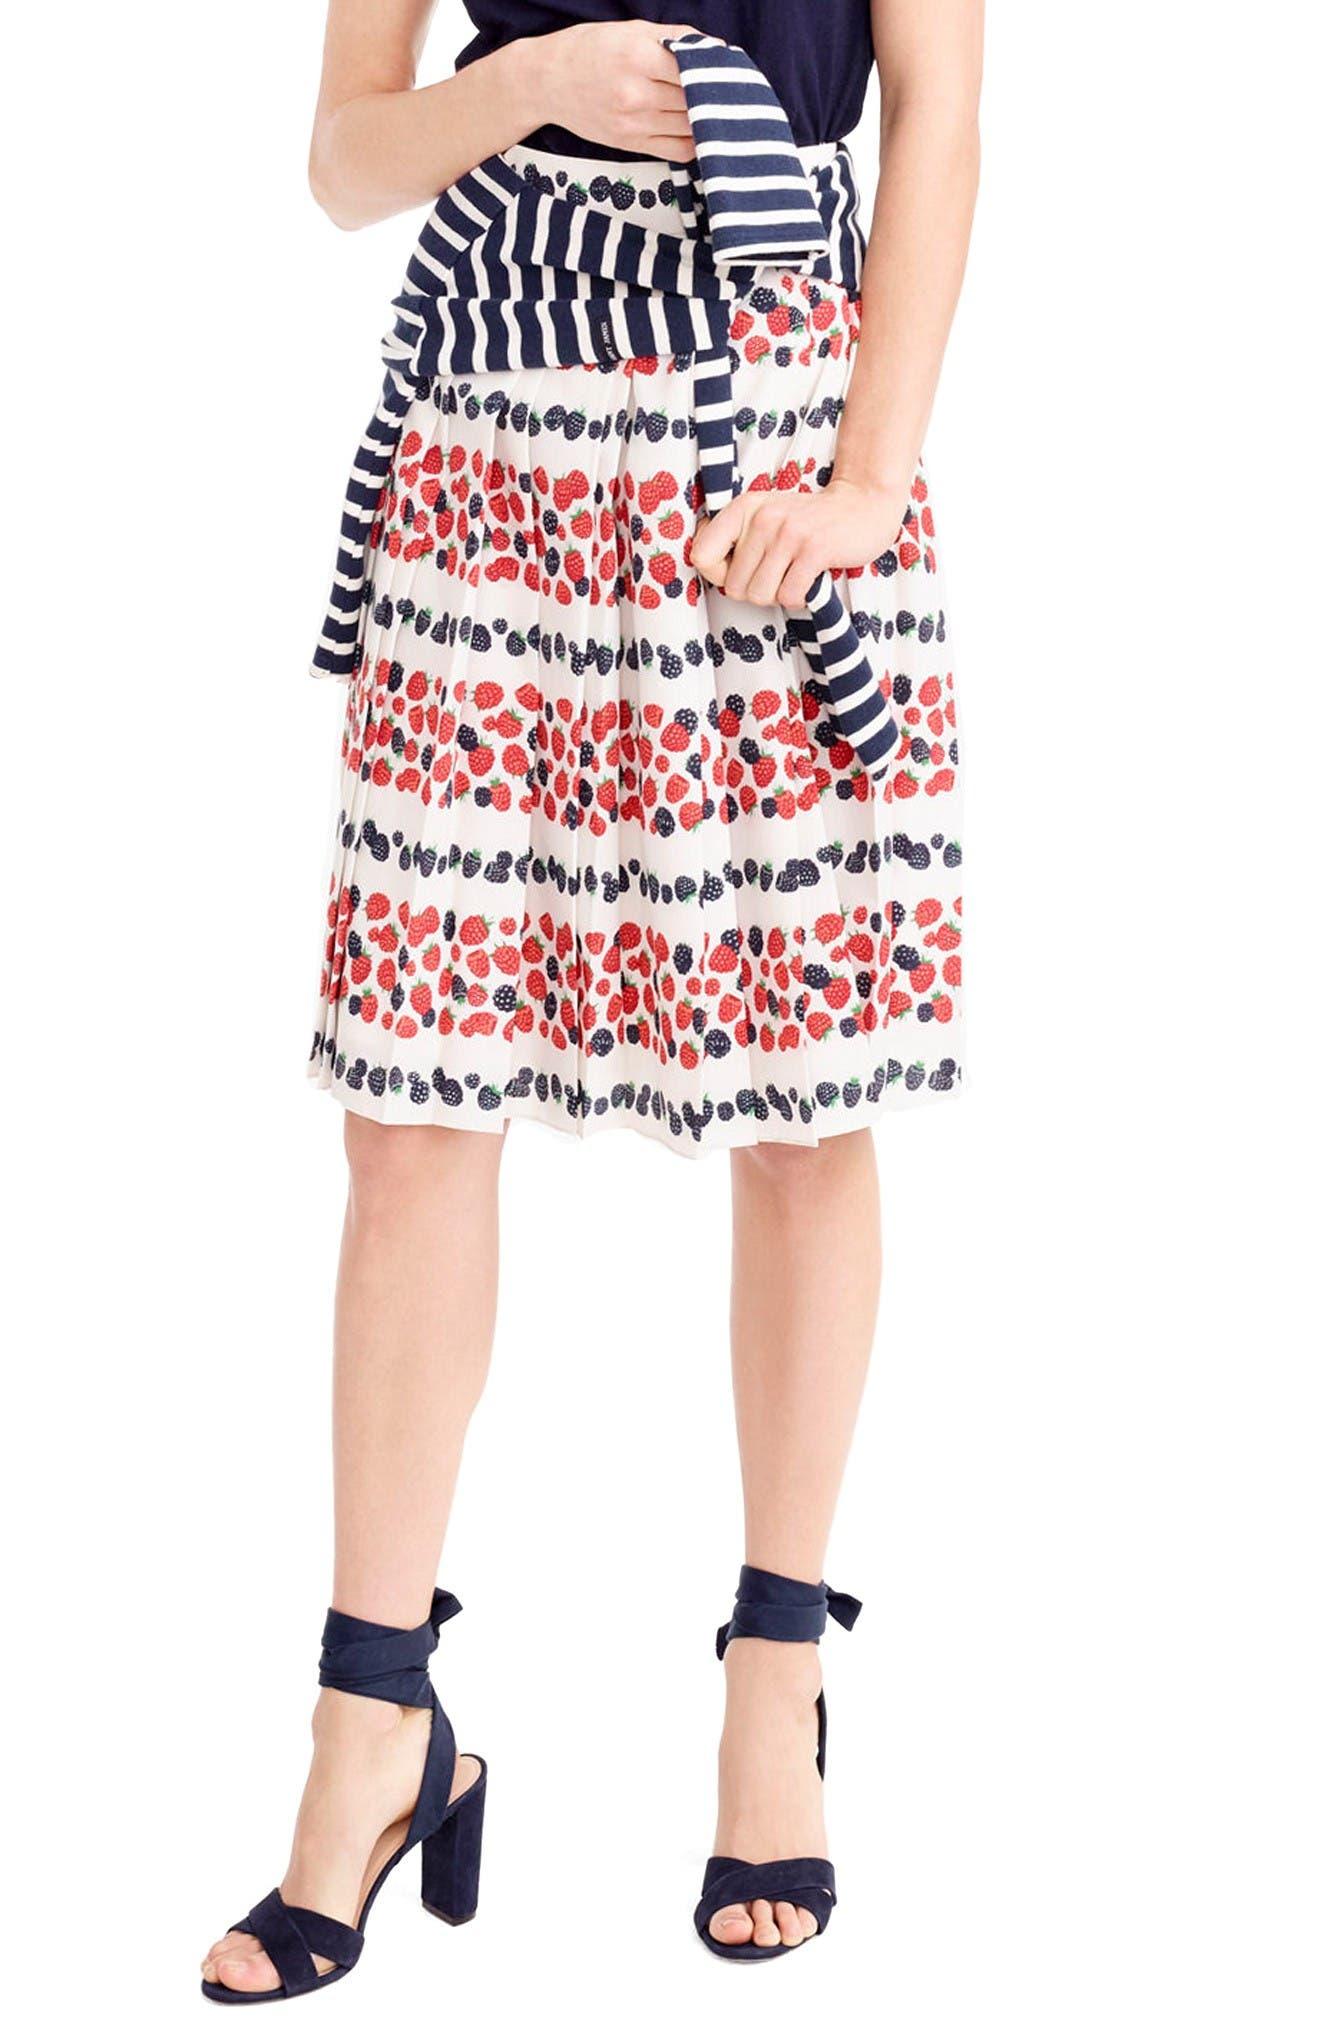 Alternate Image 1 Selected - J.Crew Berry Print Pleat Skirt